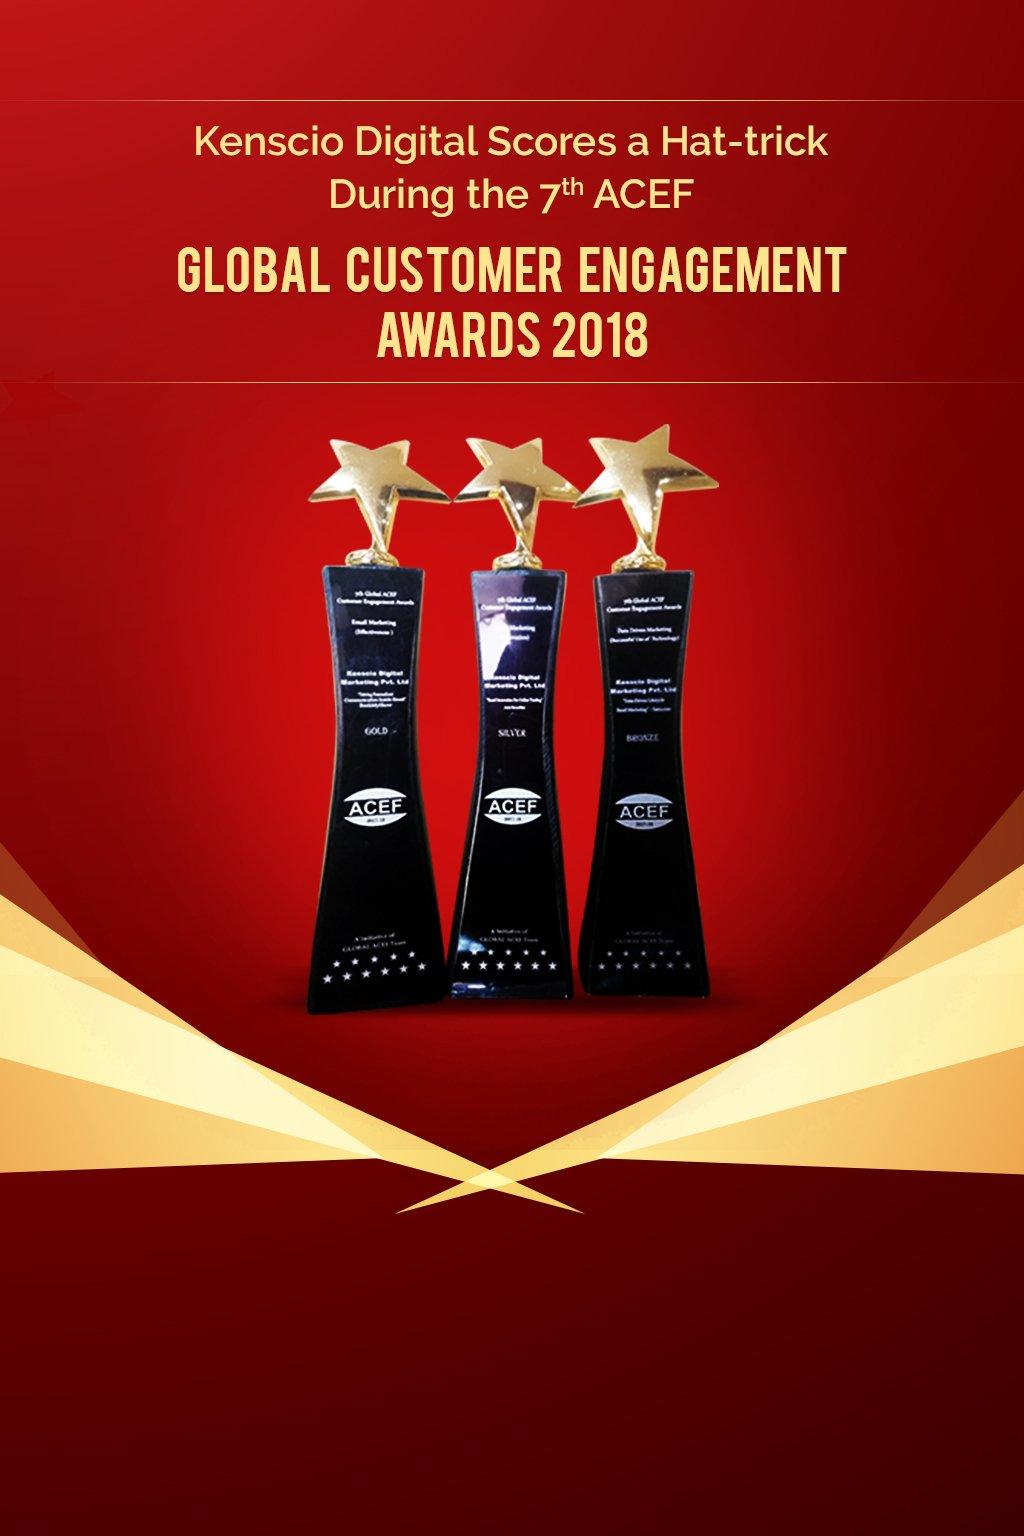 GLOBAL CUSTOMER ENGAGEMENT AWARDS 2018